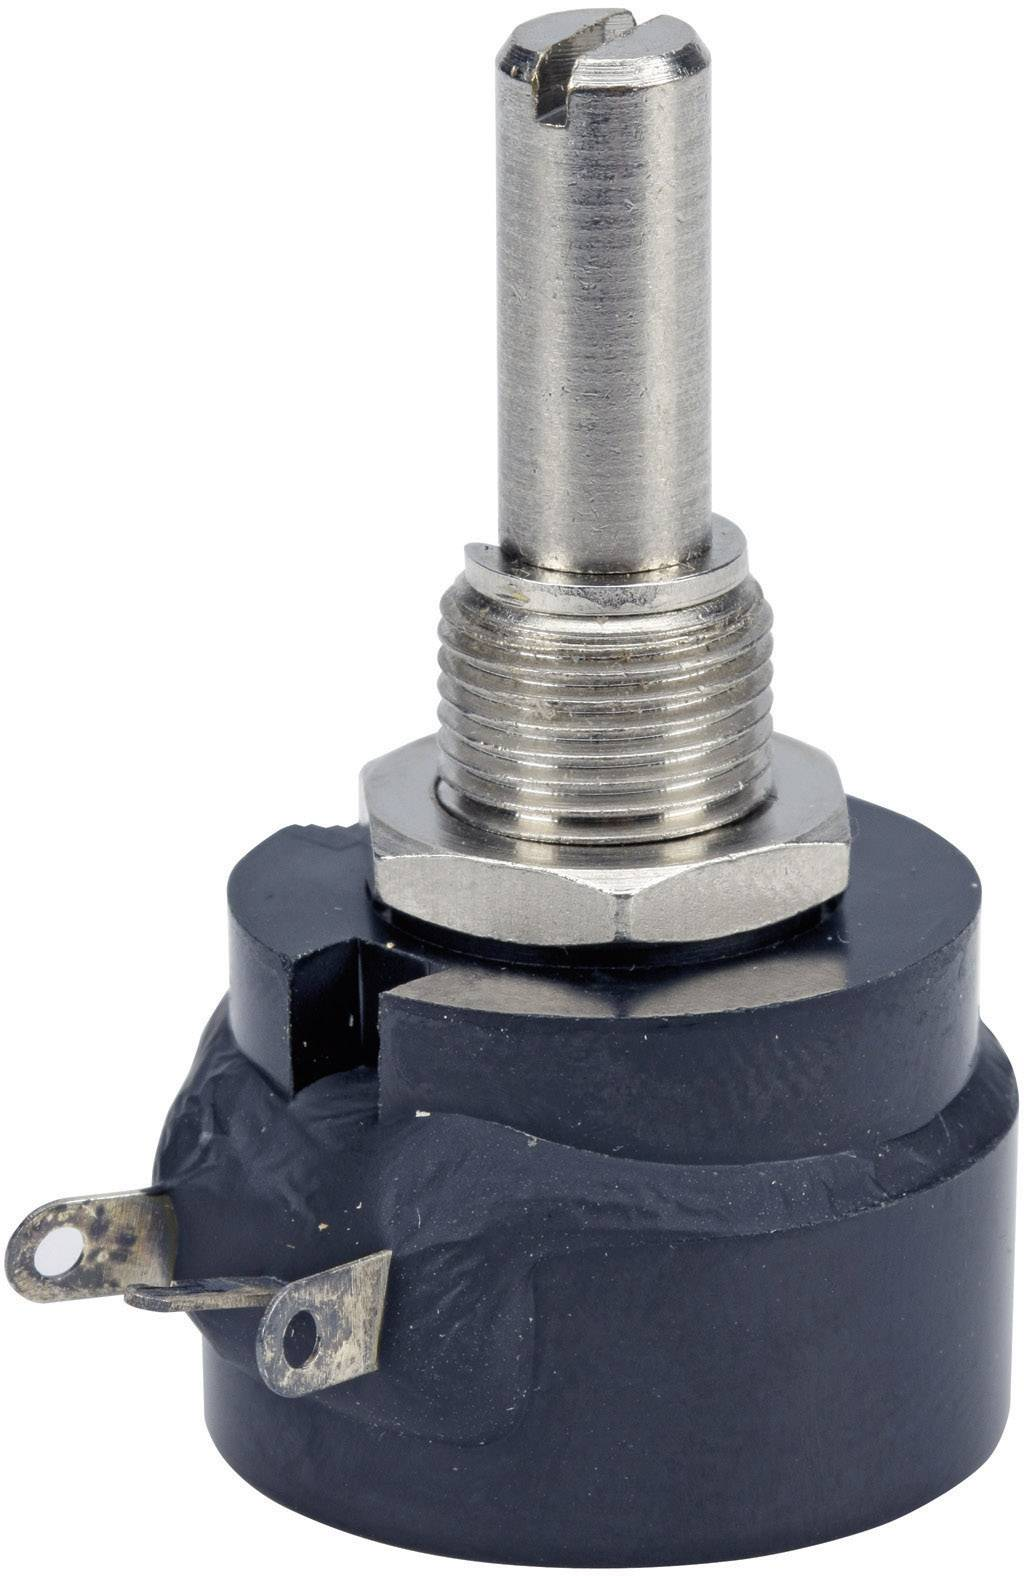 Drôtový potenciometer mono TT Electronics AB 3101206160 3101206160, 0.5 W, 5 kOhm, 1 ks